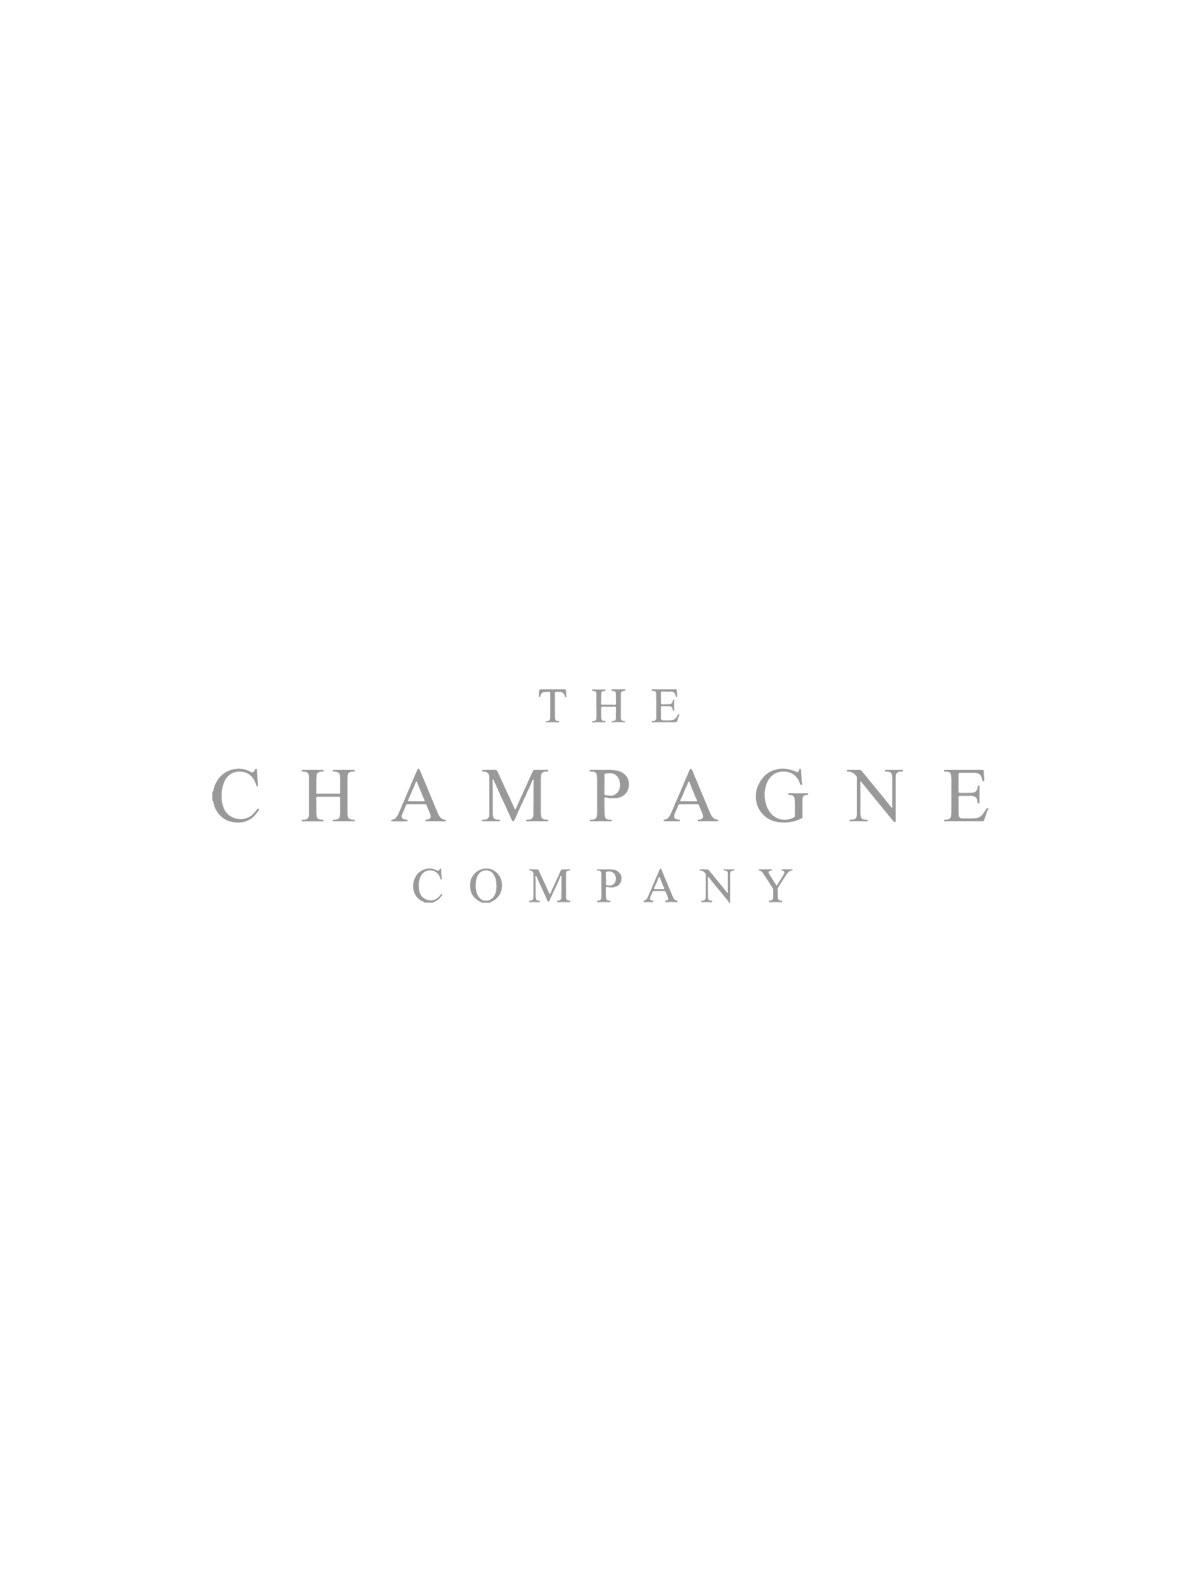 Robert Mondavi Twin Oaks Cabernet Sauvignon 2013 Wine California